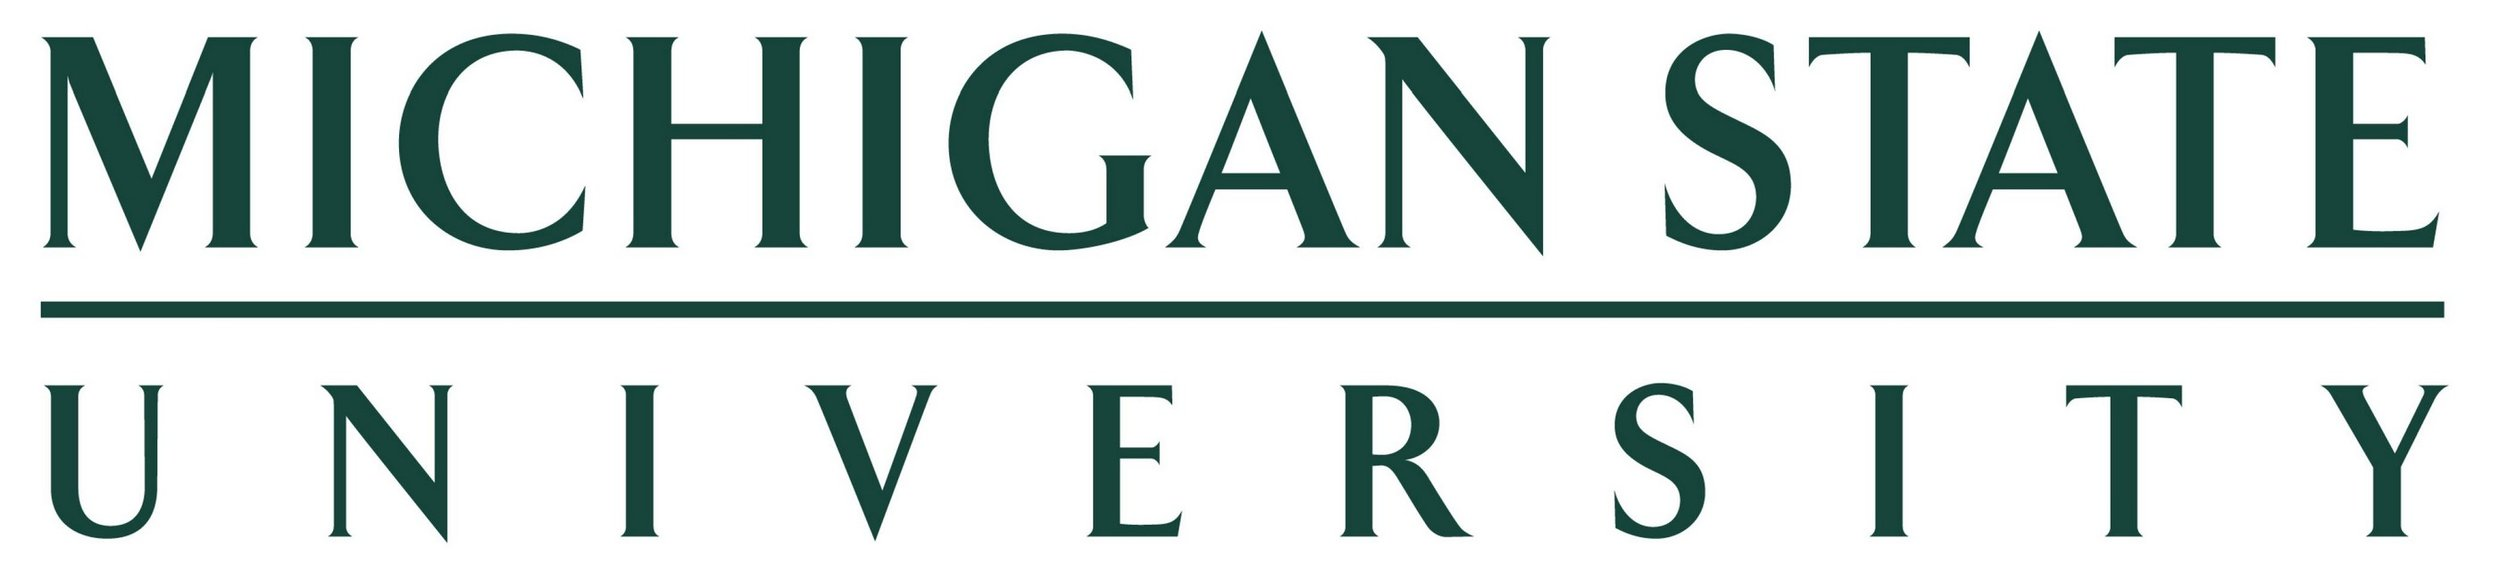 msu-michigan-state-university-logo.jpg